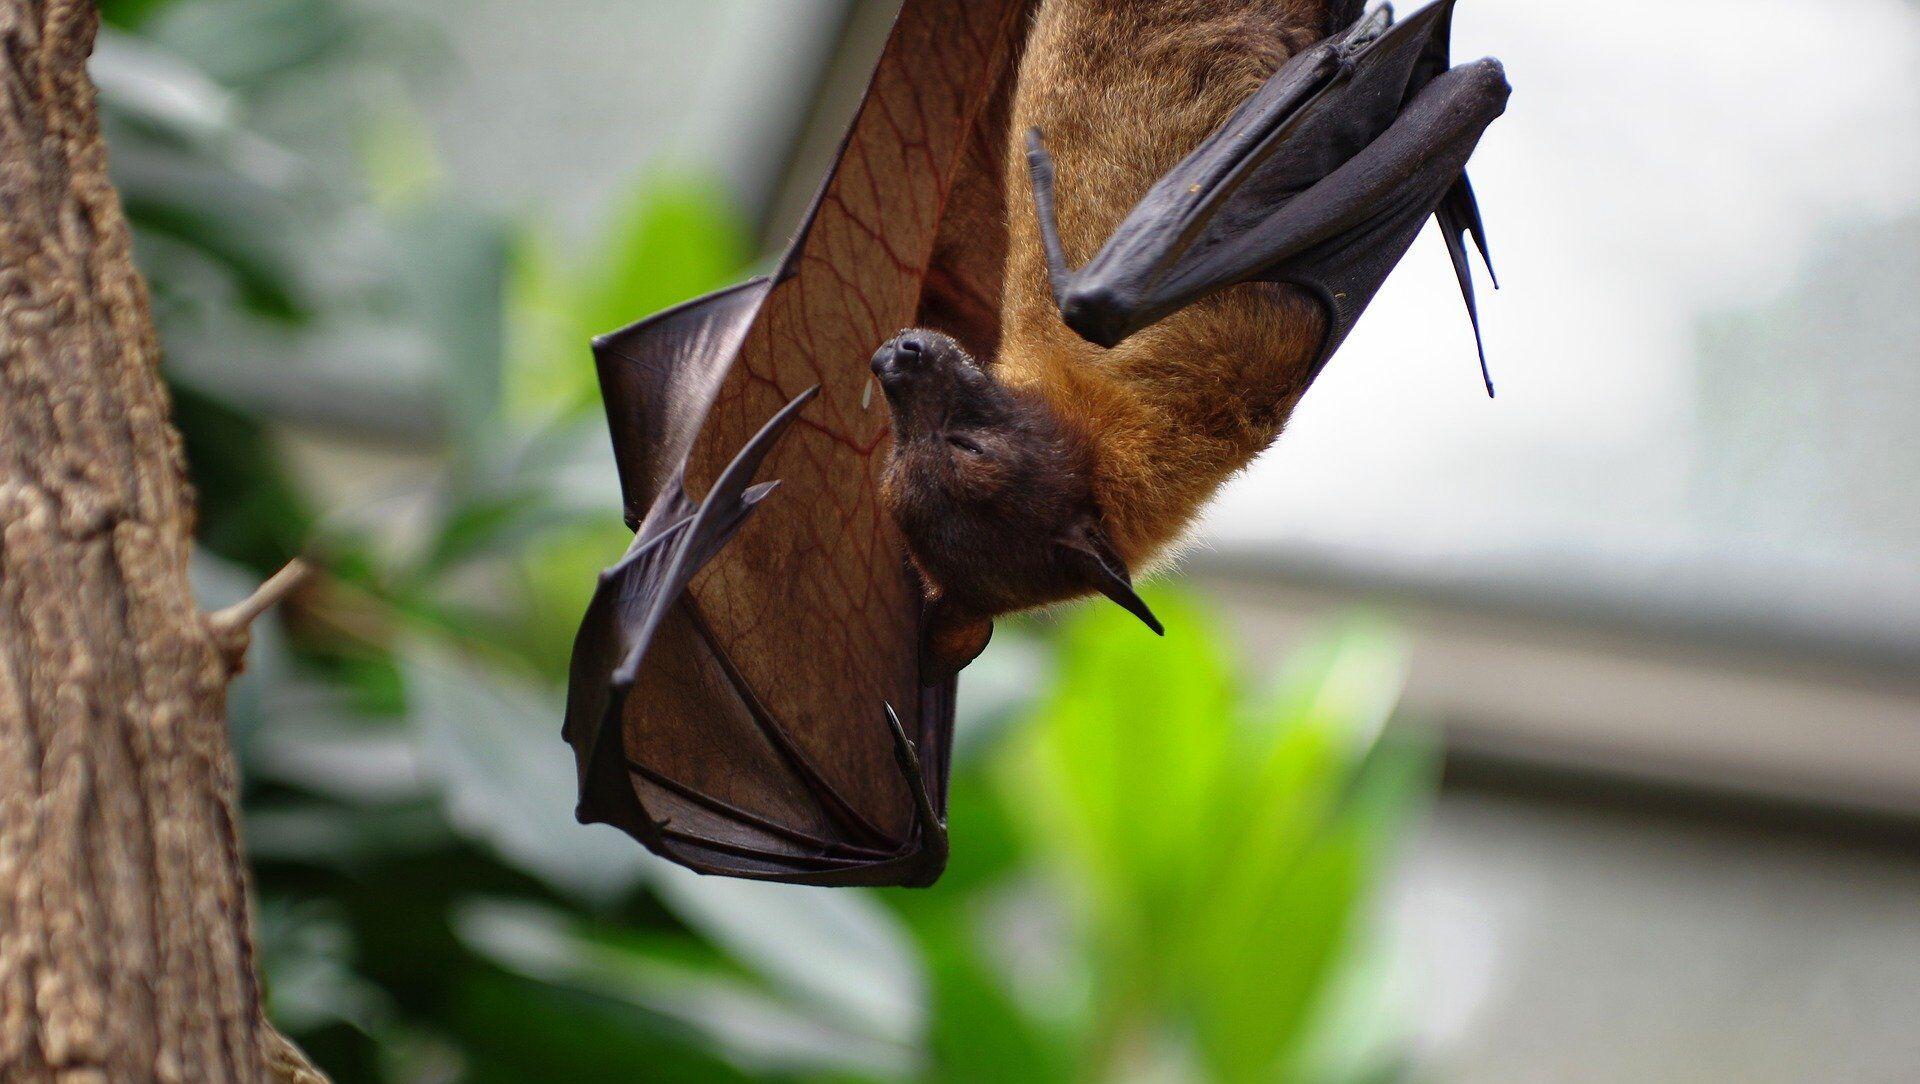 Un murciélago, imagen referencial - Sputnik Mundo, 1920, 09.02.2021